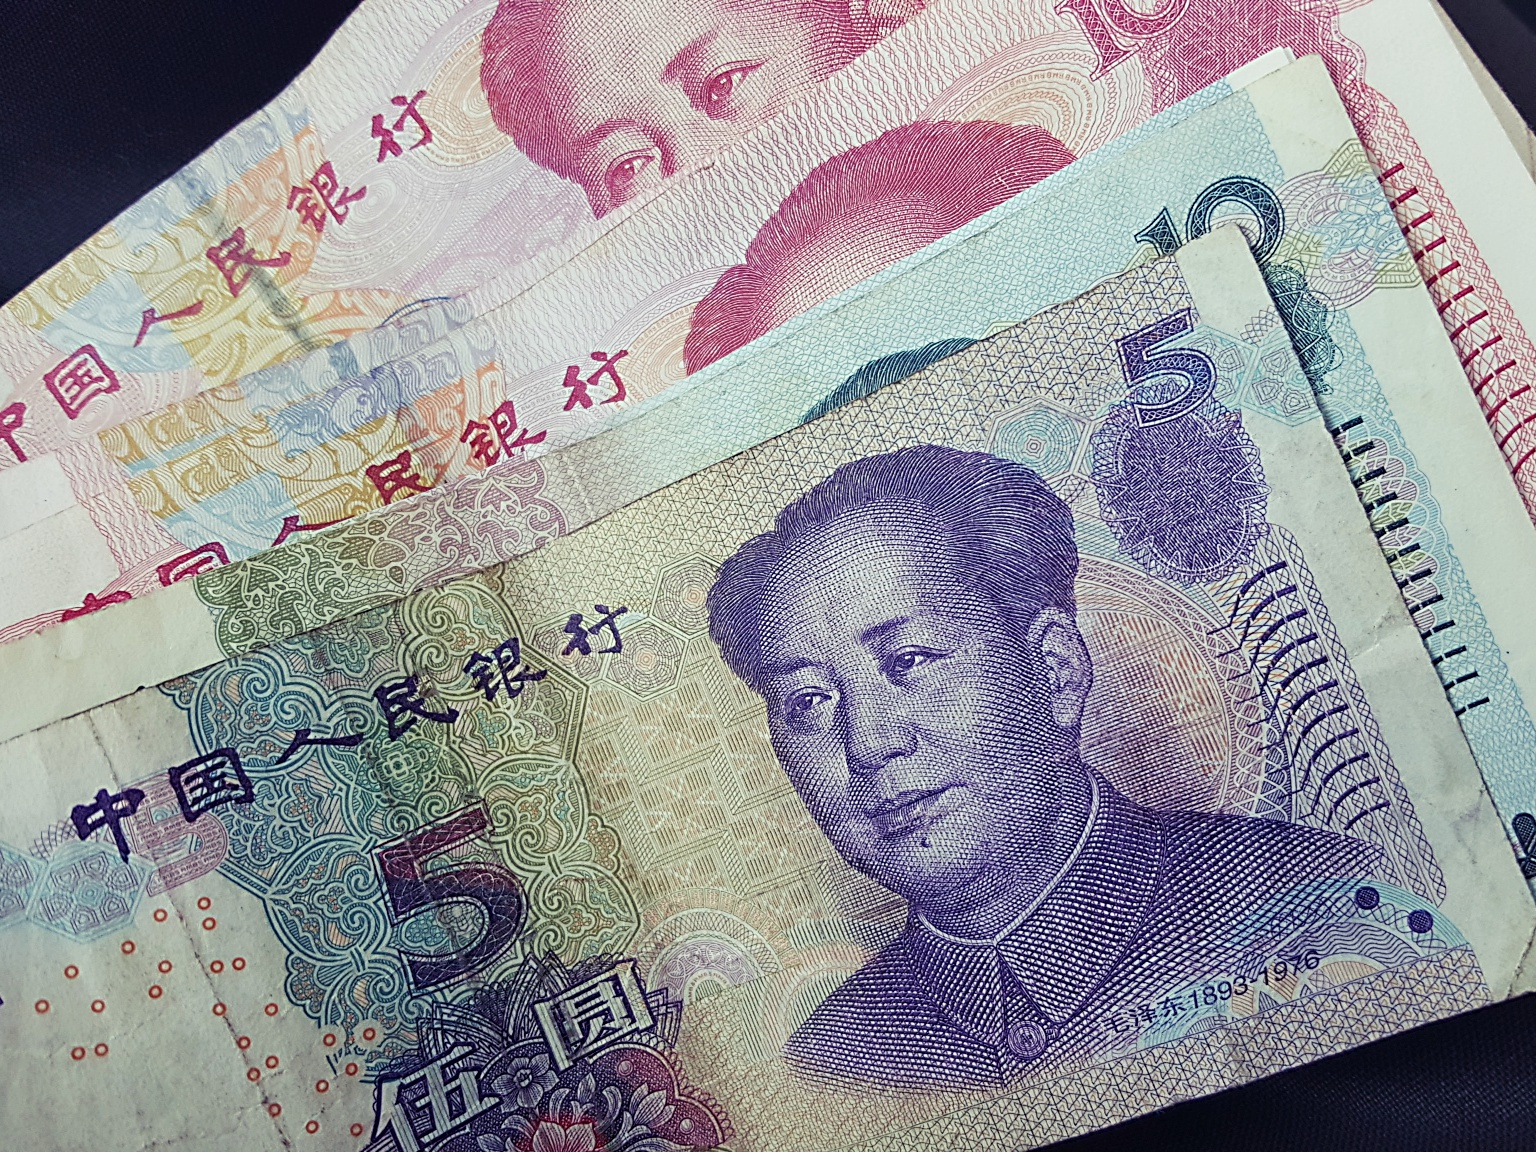 CNY Yuan Renminbi